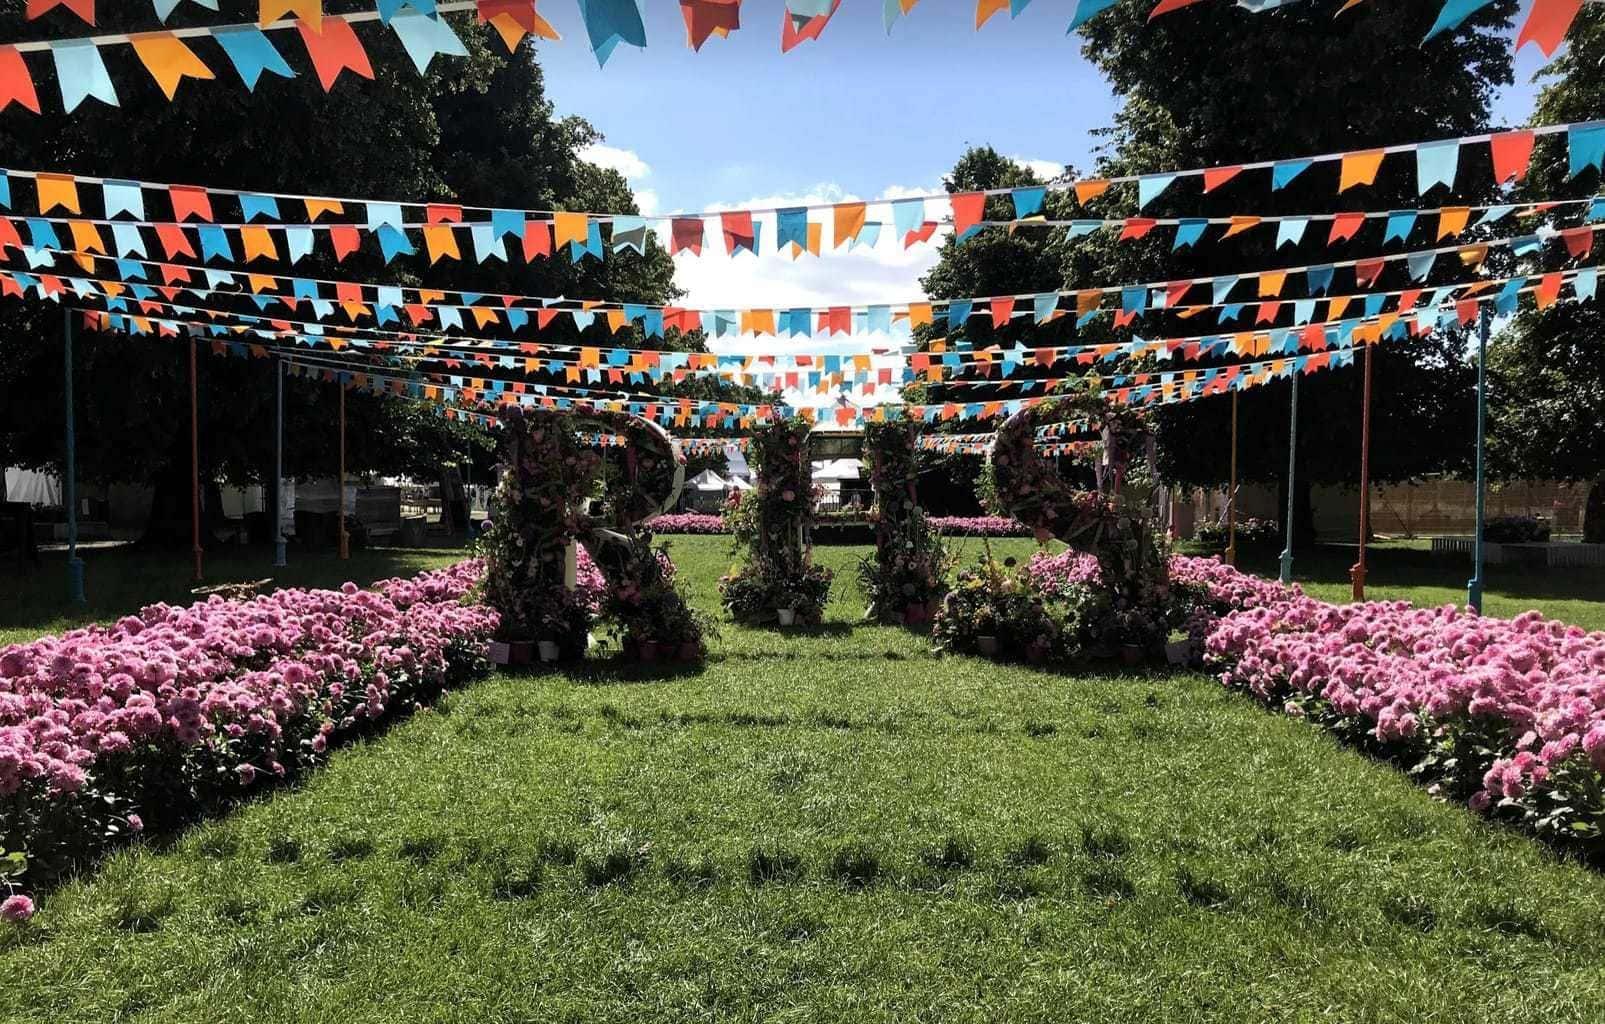 Hampton Court Palace Garden Festival 2019